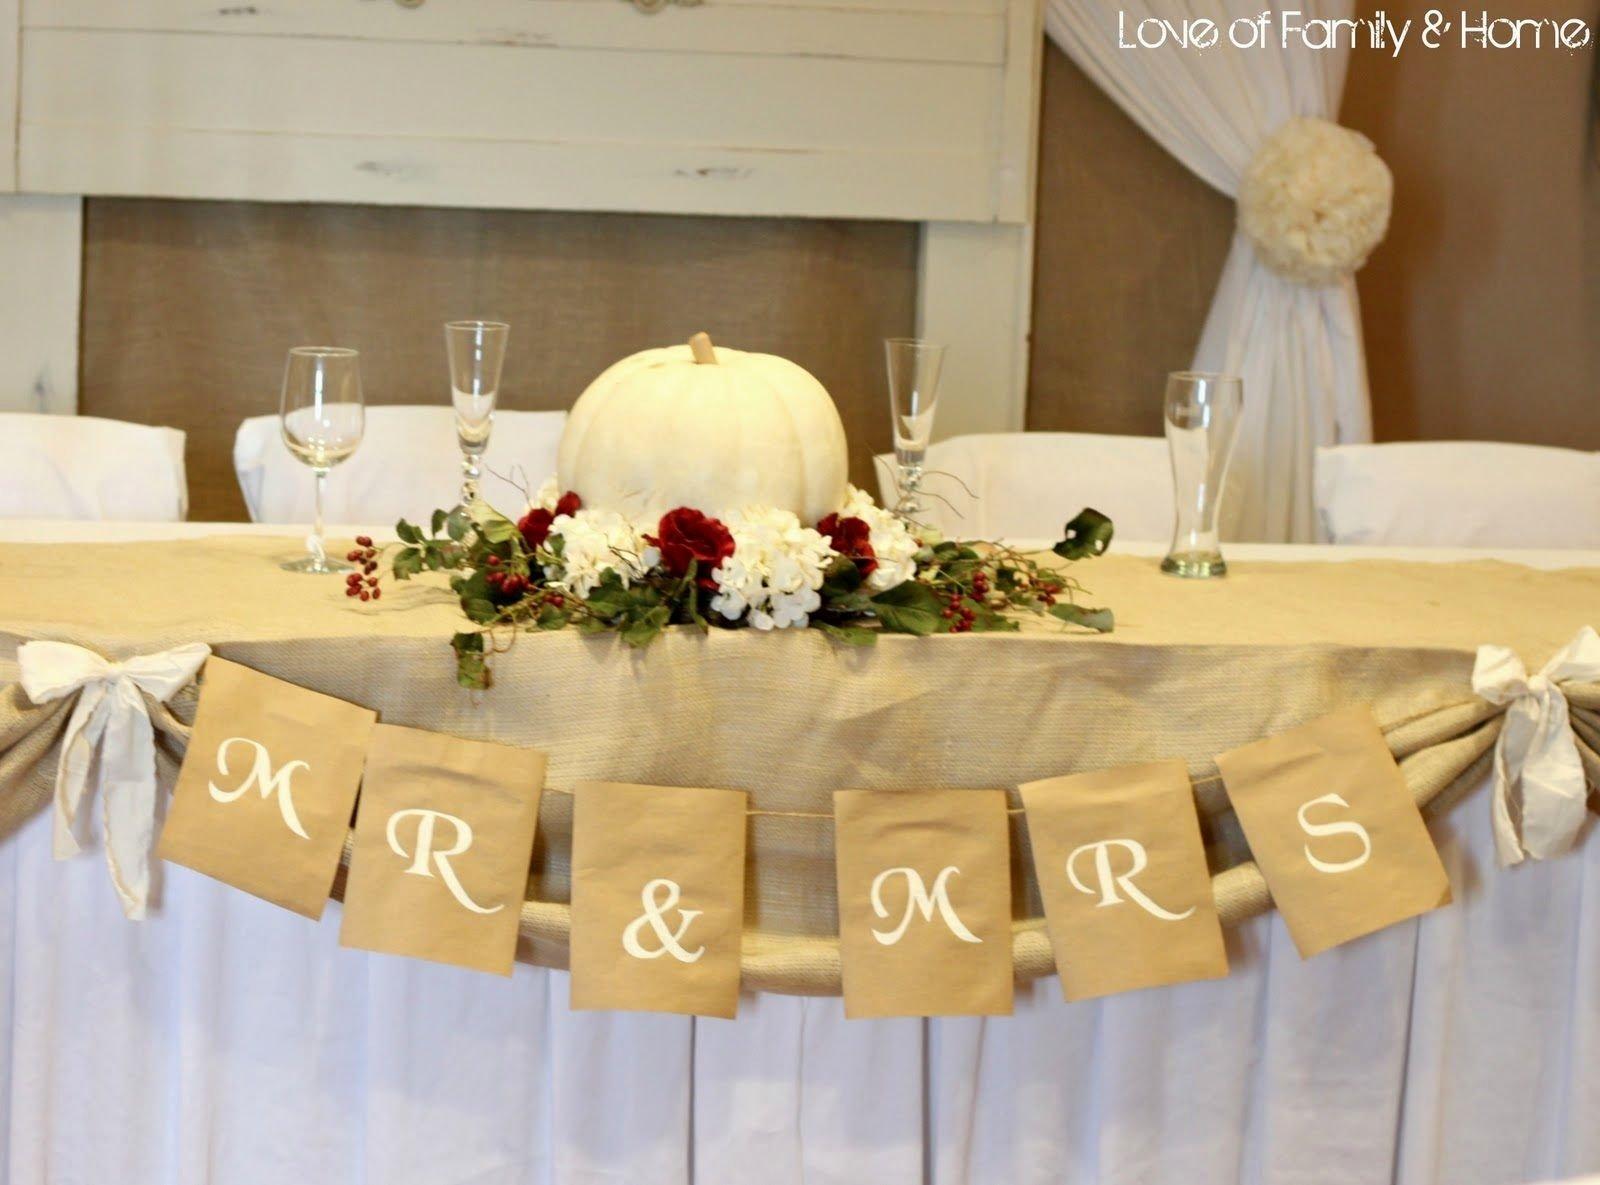 10 Unique Wedding Reception Ideas On A Budget wedding decor fresh wedding decorating ideas on a budget in 2018 2020